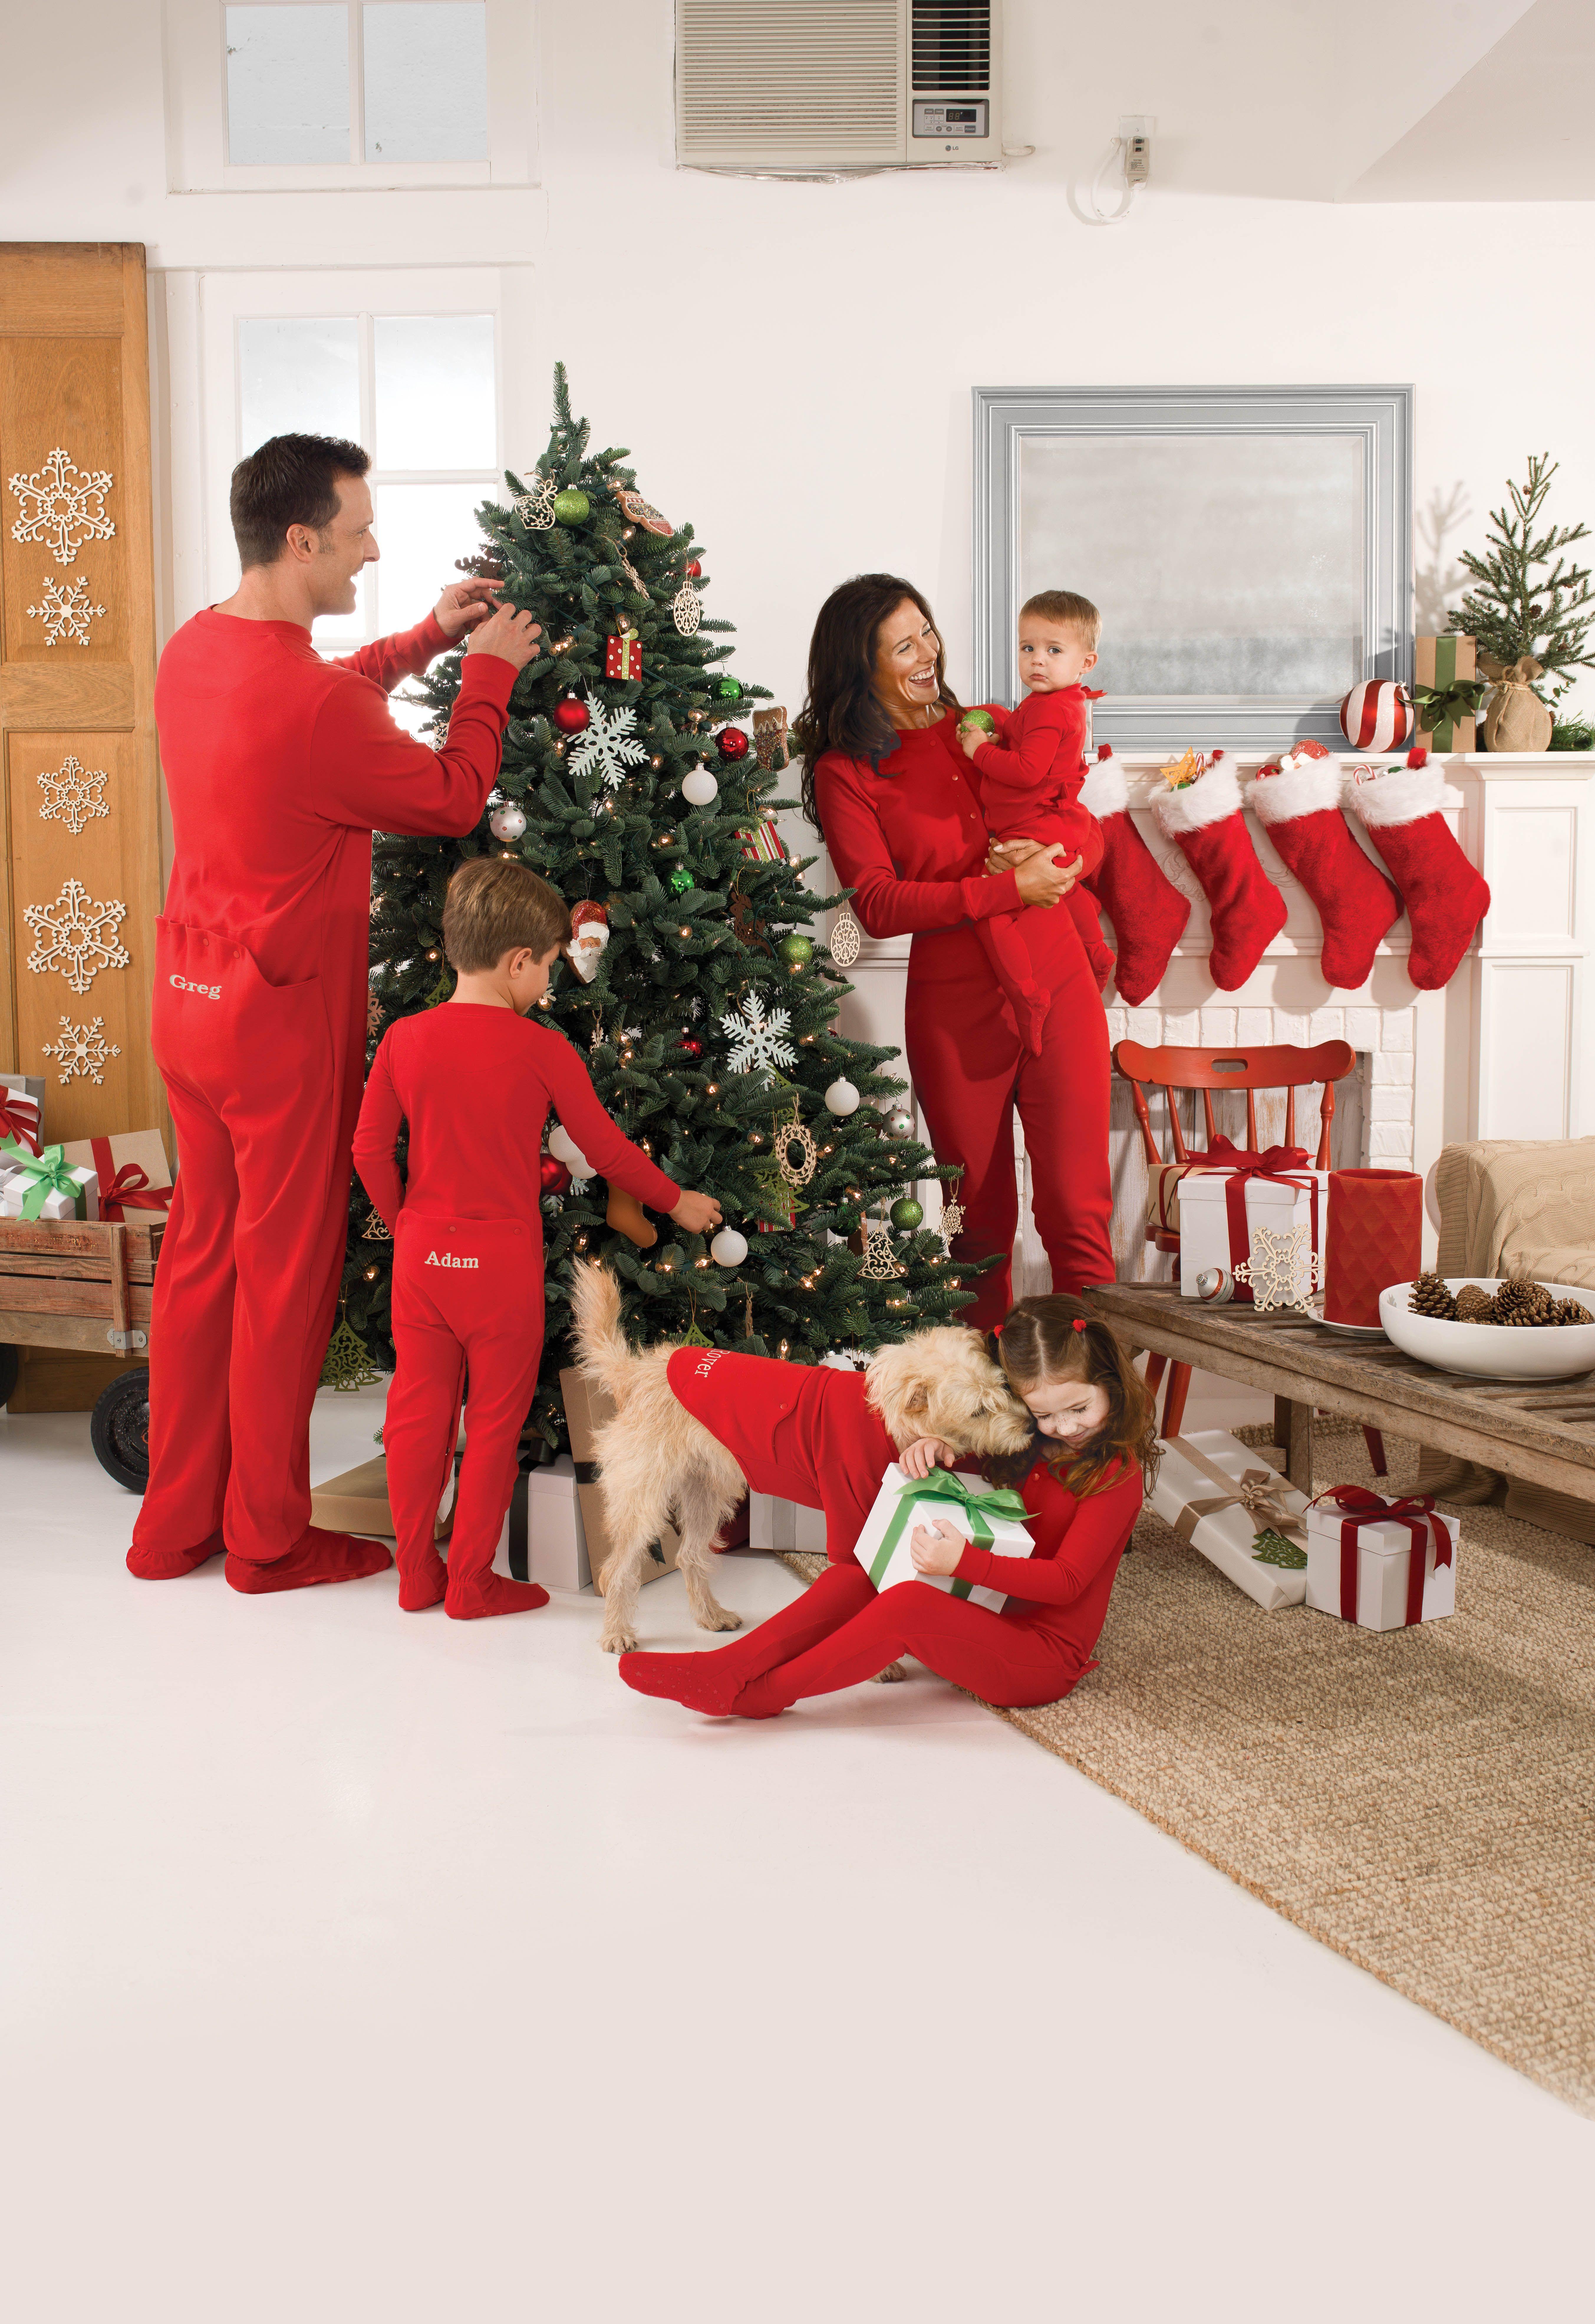 a2274b0478 Red Dropseat Matching Family Pajamas - PajamaGram